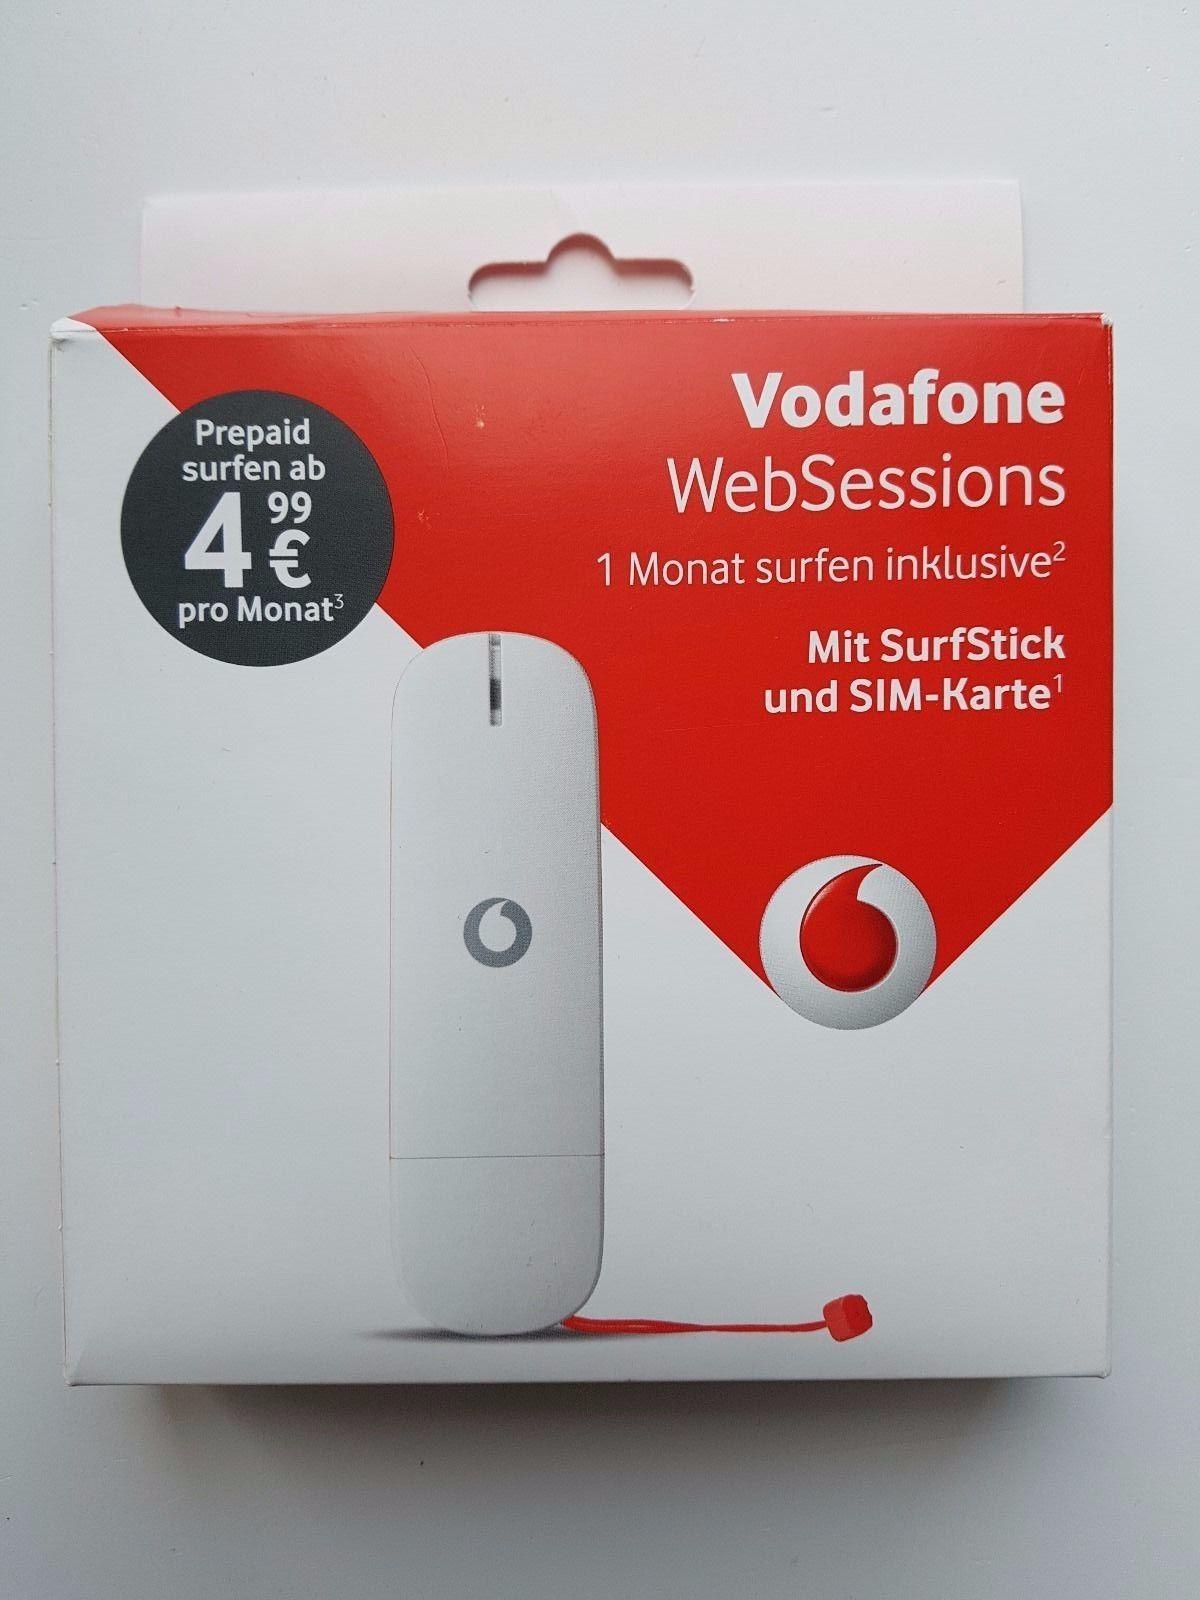 [Lokal Expert Langenhagen] Vodafone Surfstick K4203 für €11,99 inkl. 1. Monat bzw. 200MB